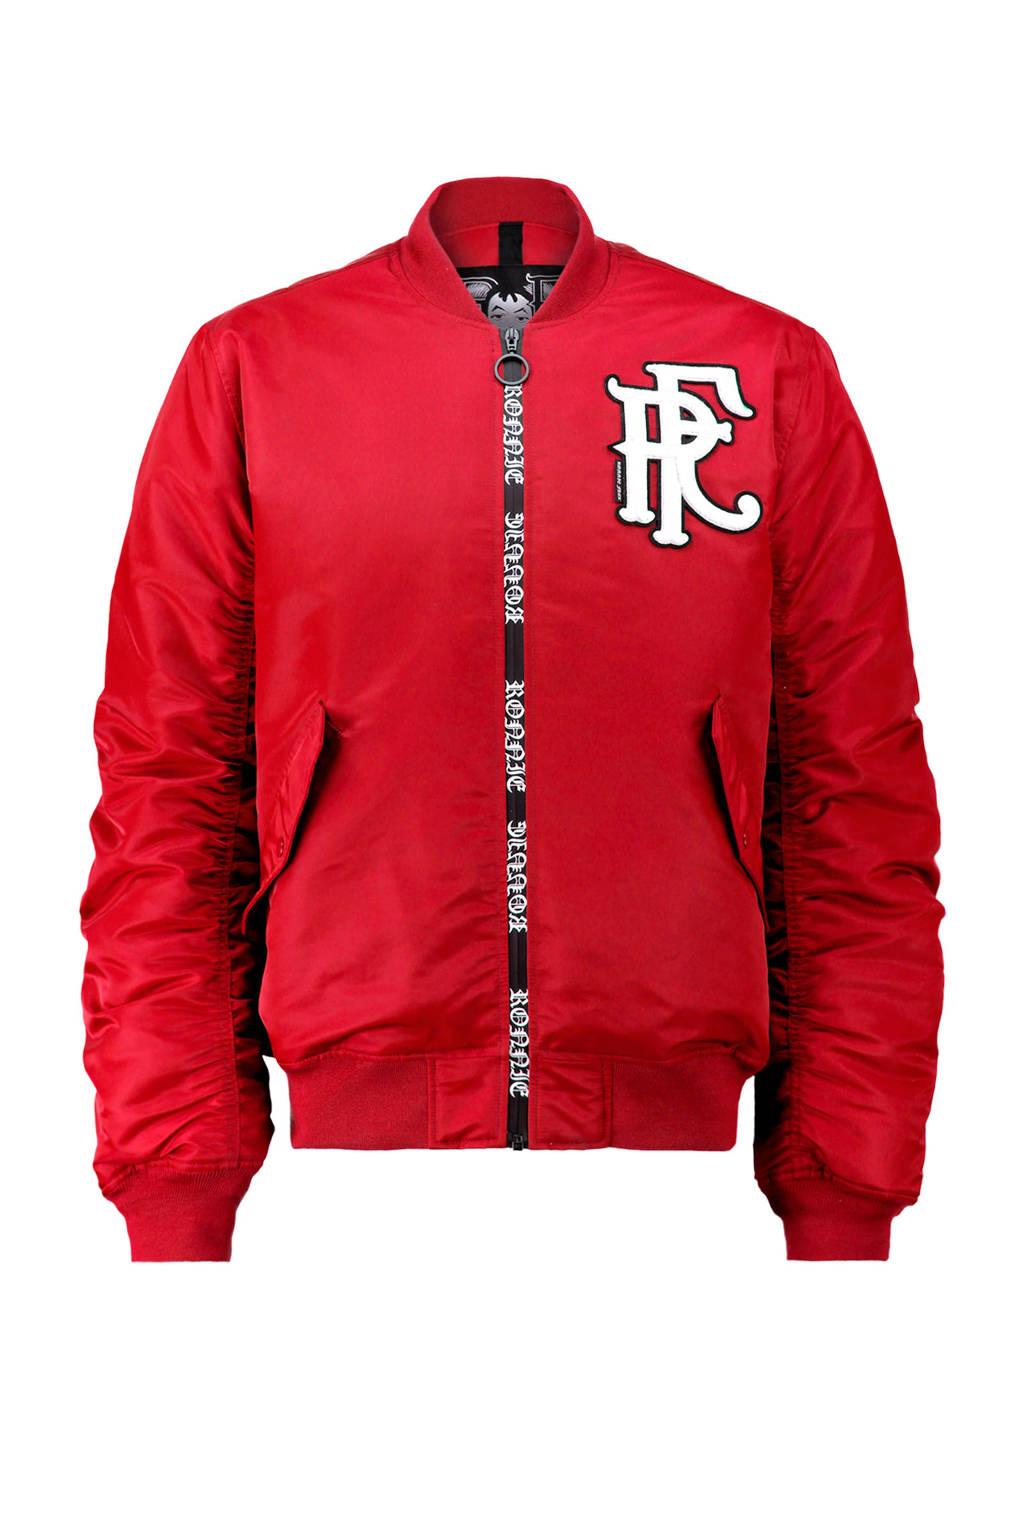 CoolCat Ronnie Flex bomberjack rood, Rood